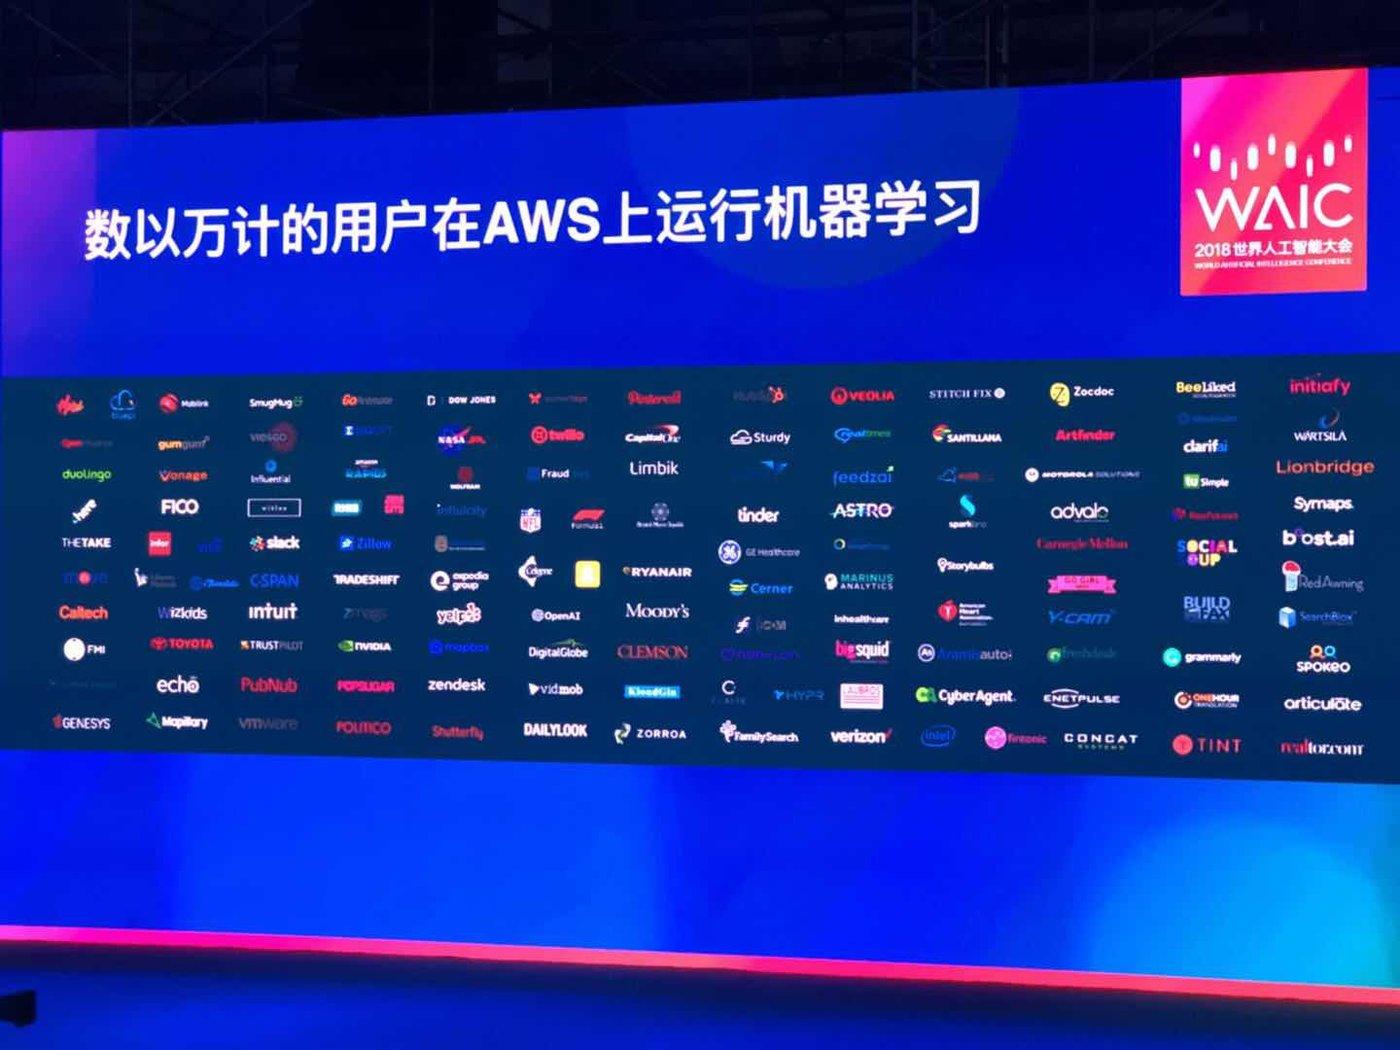 Swami 在2018世界人工智能大会上展示出的亚马逊 AWS 客户列表